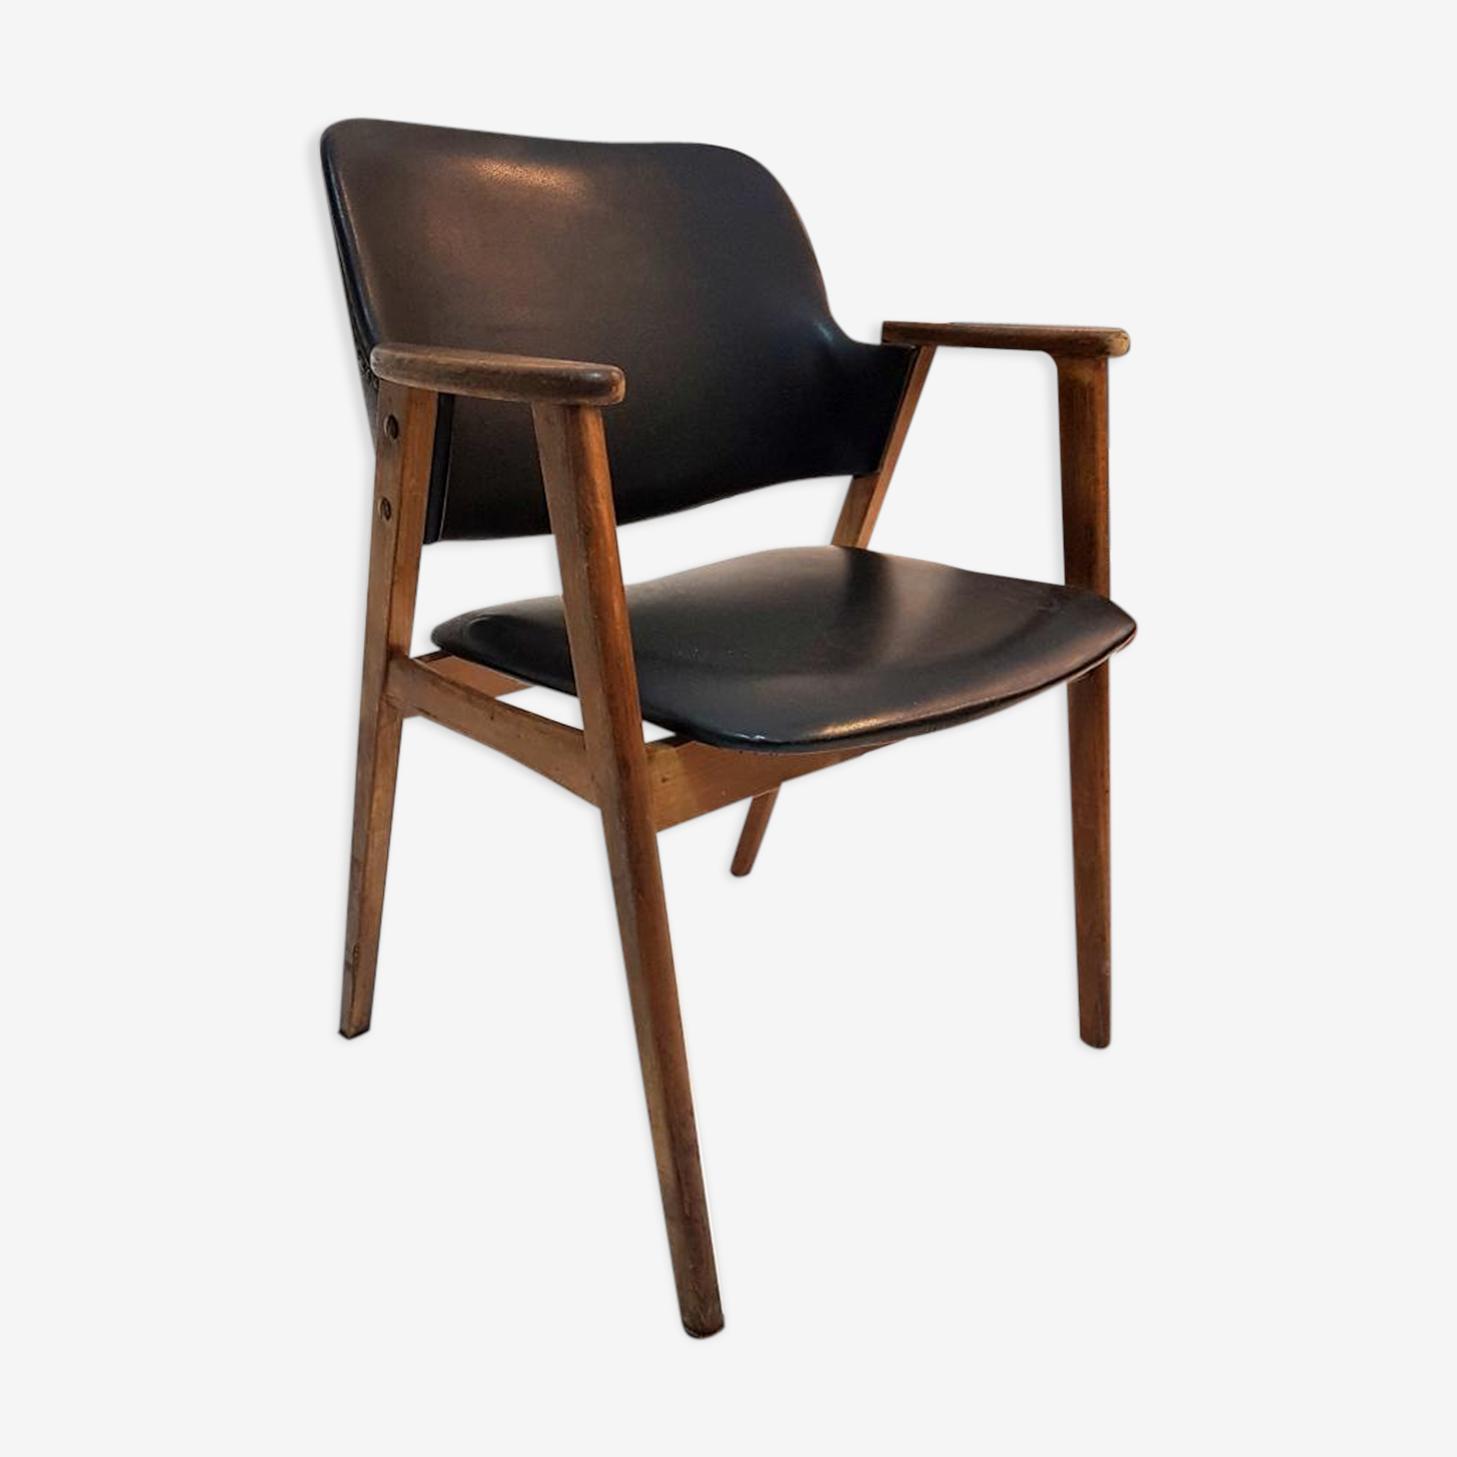 Chaise en teck scandinave 1960s